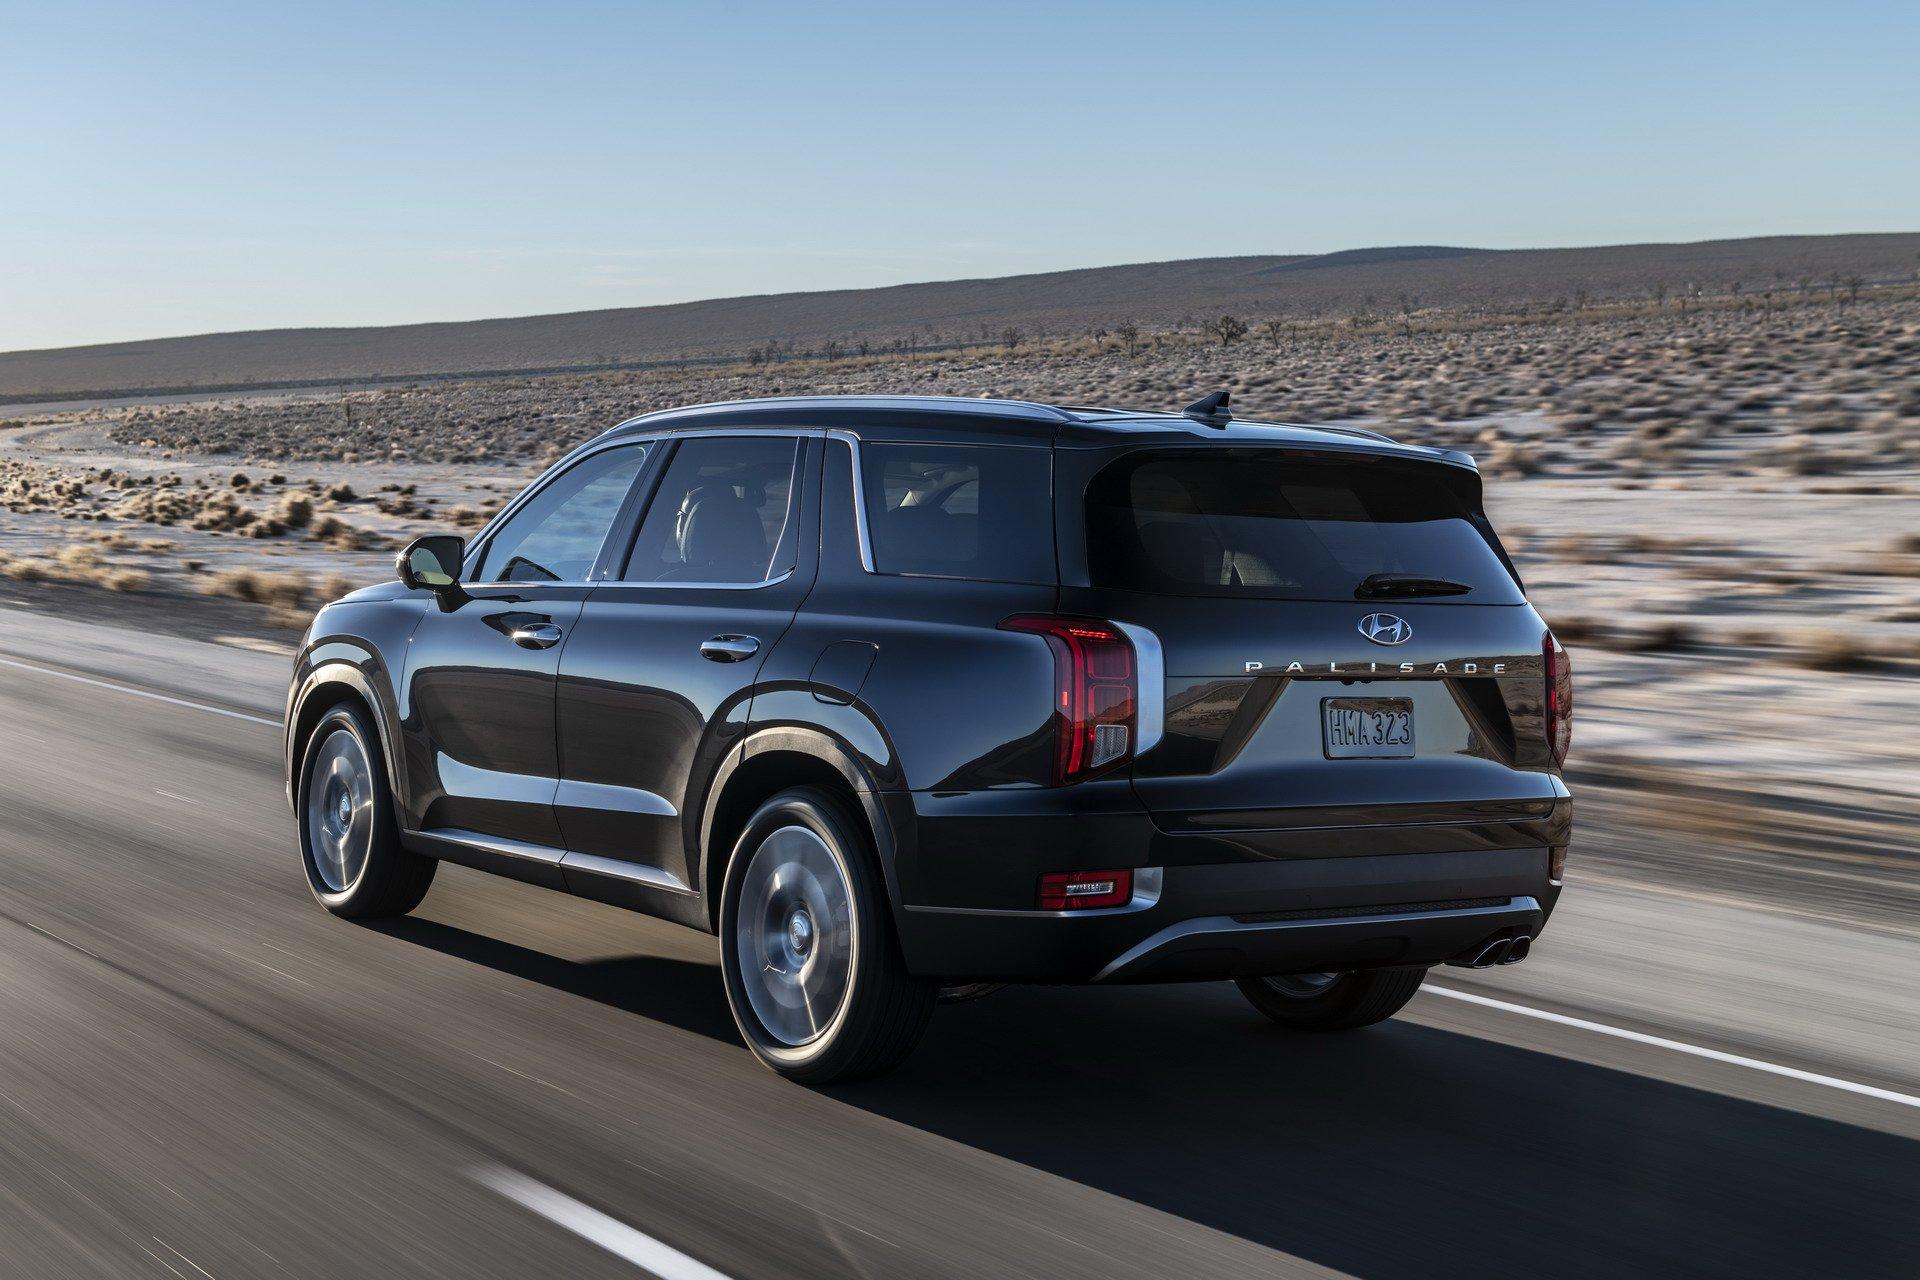 2020 Hyundai Palisade Pricing Announced, Undercuts the ...